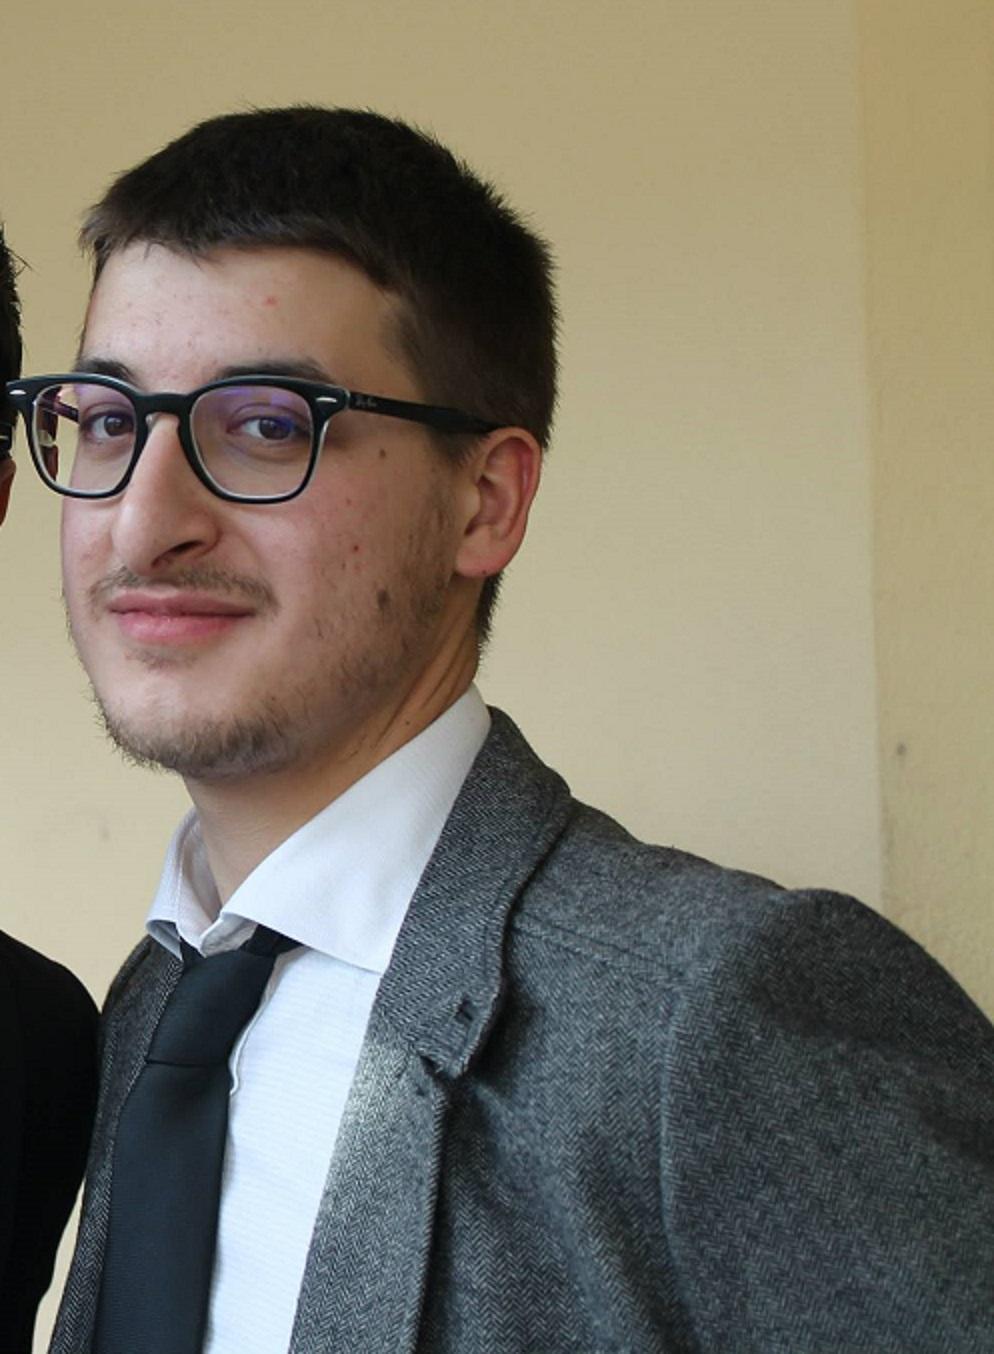 Daniele Fulvi